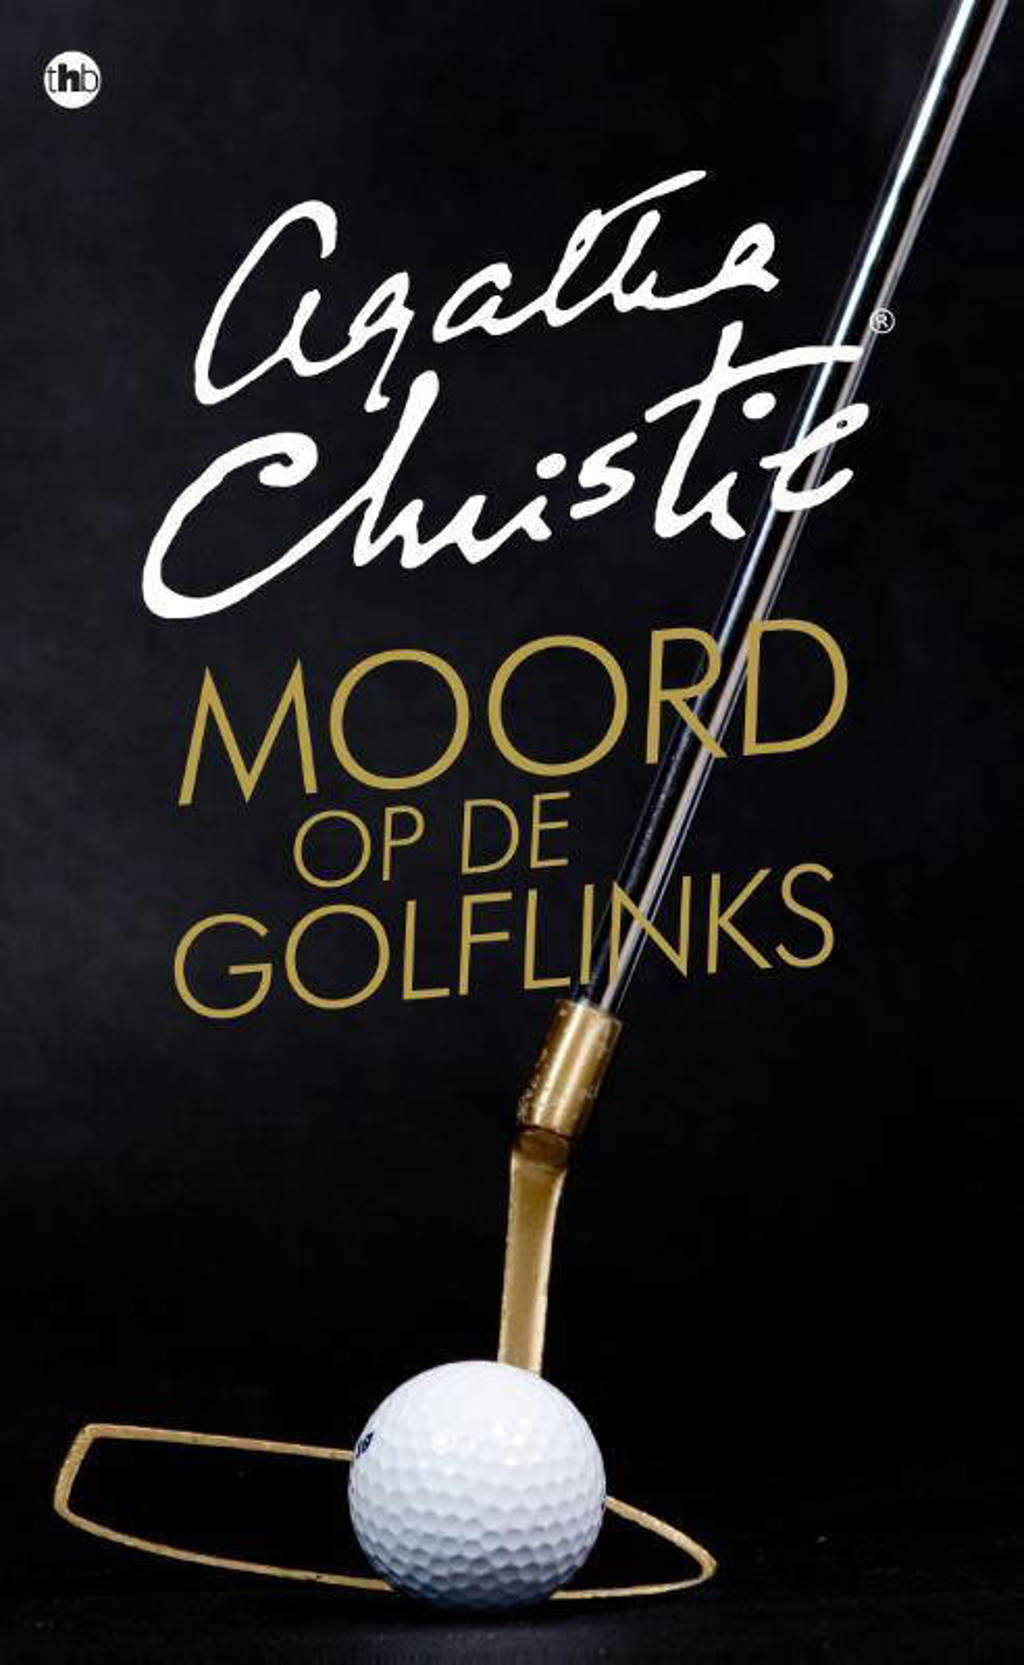 Poirot: Moord op de golflinks - Agatha Christie